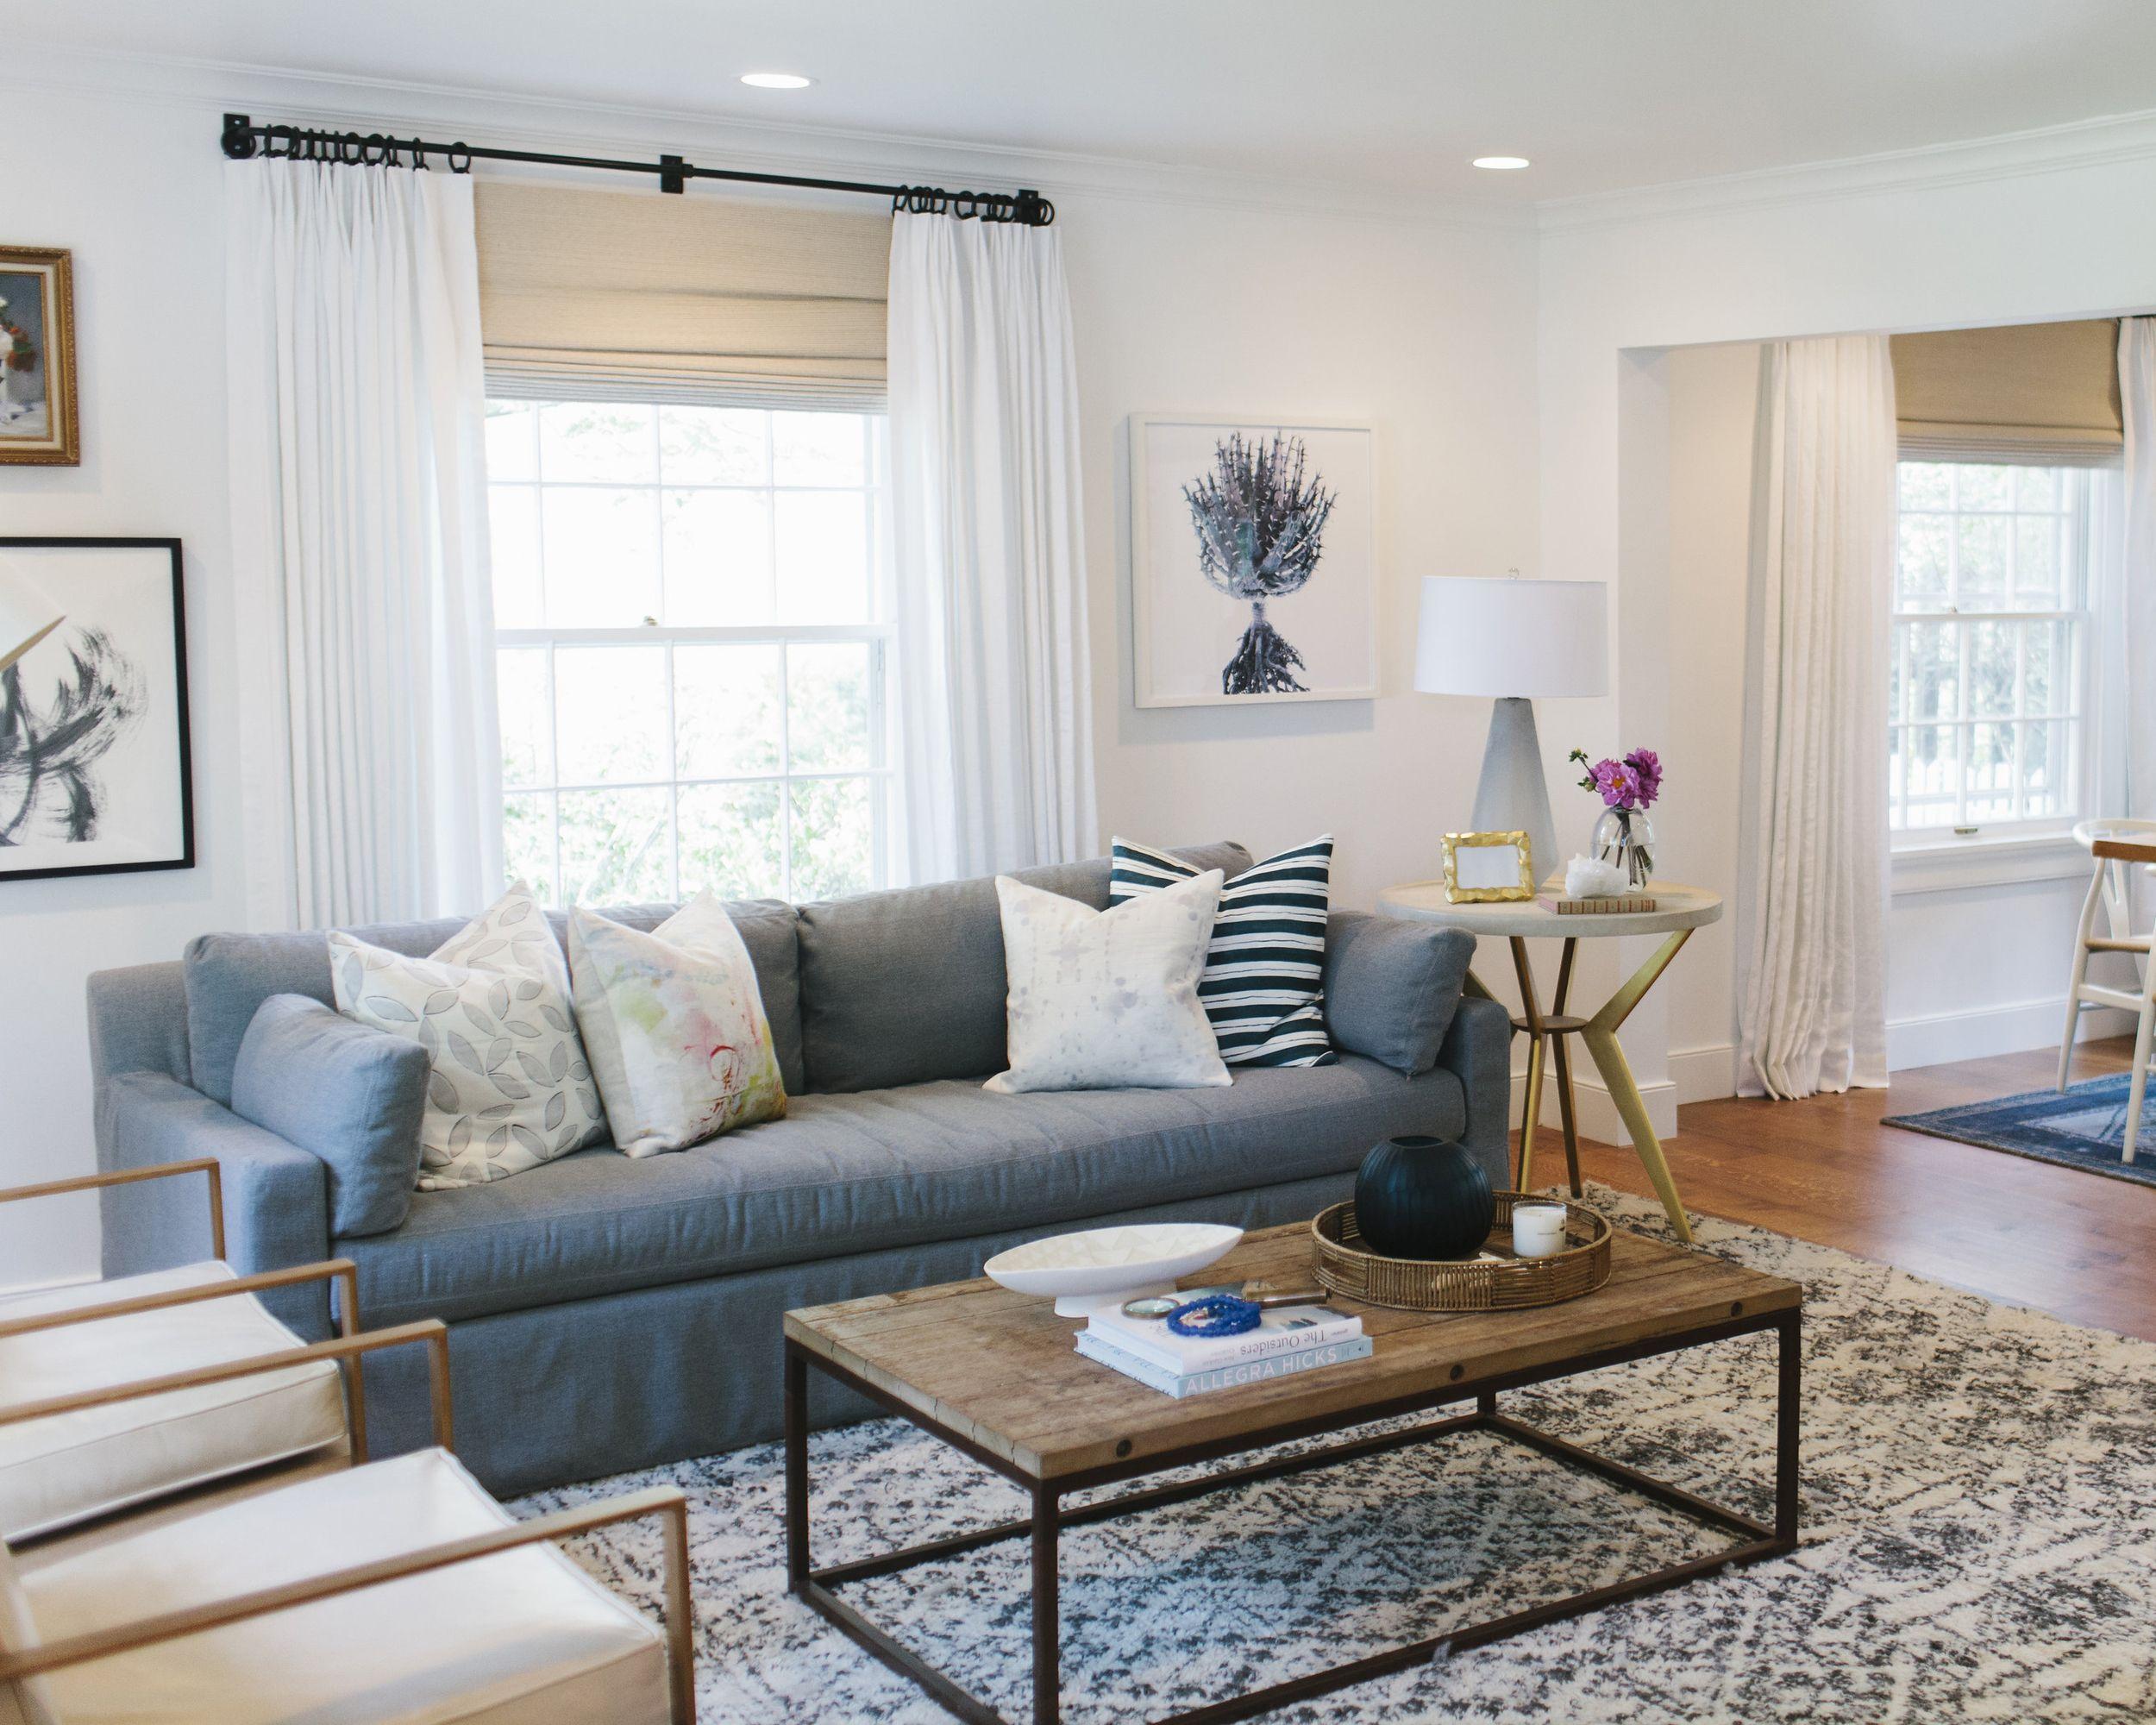 Lynwood Remodel: Living & Dining Room | Studio mcgee, Living rooms ...